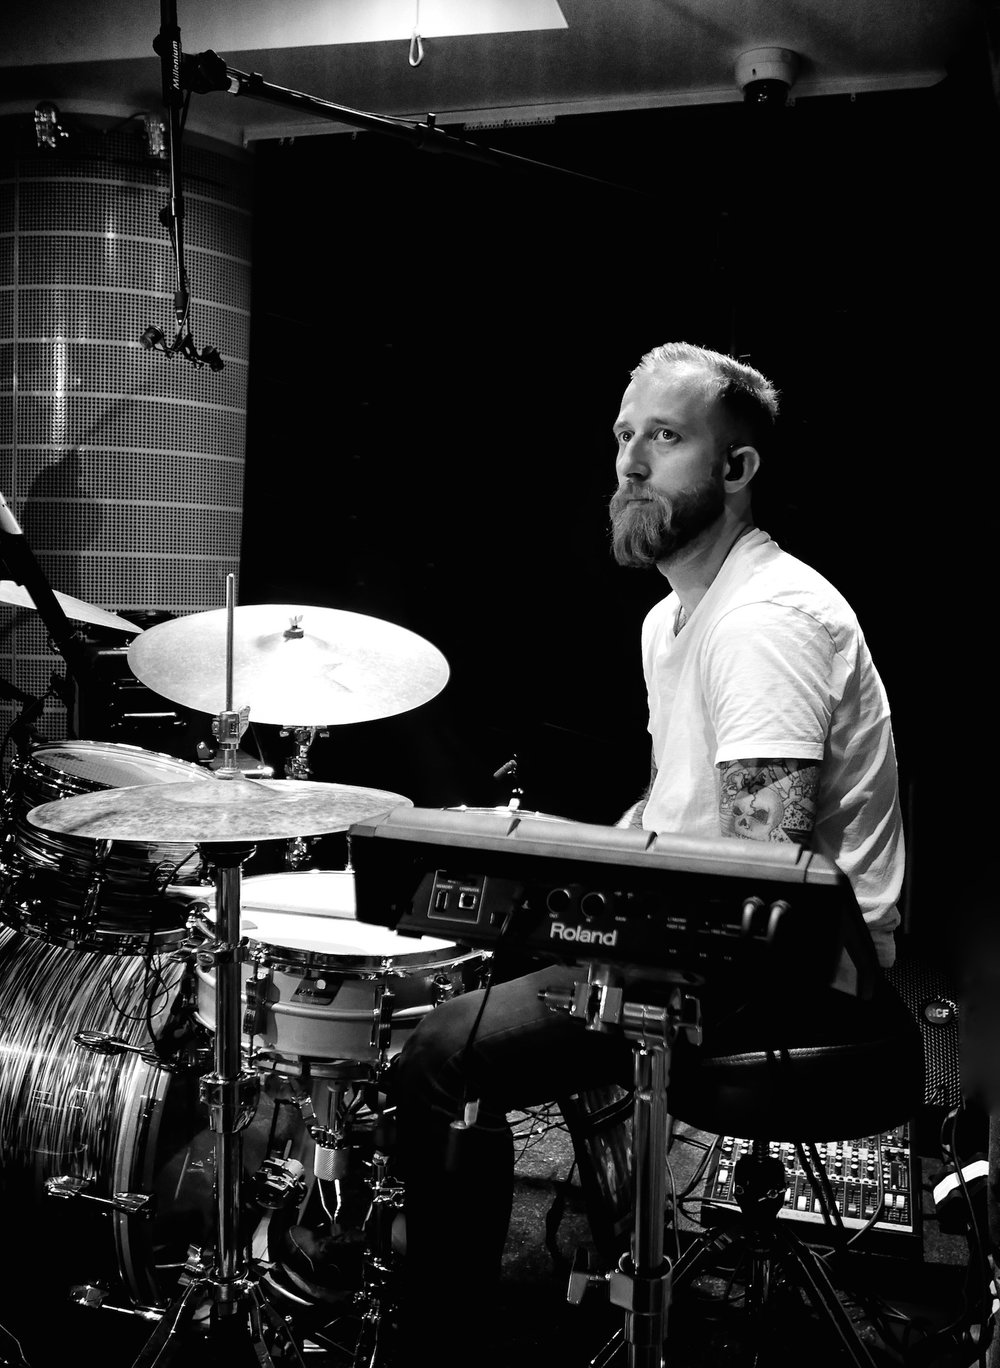 Jonny Brister, drummer with Mirror Fury, London 2017